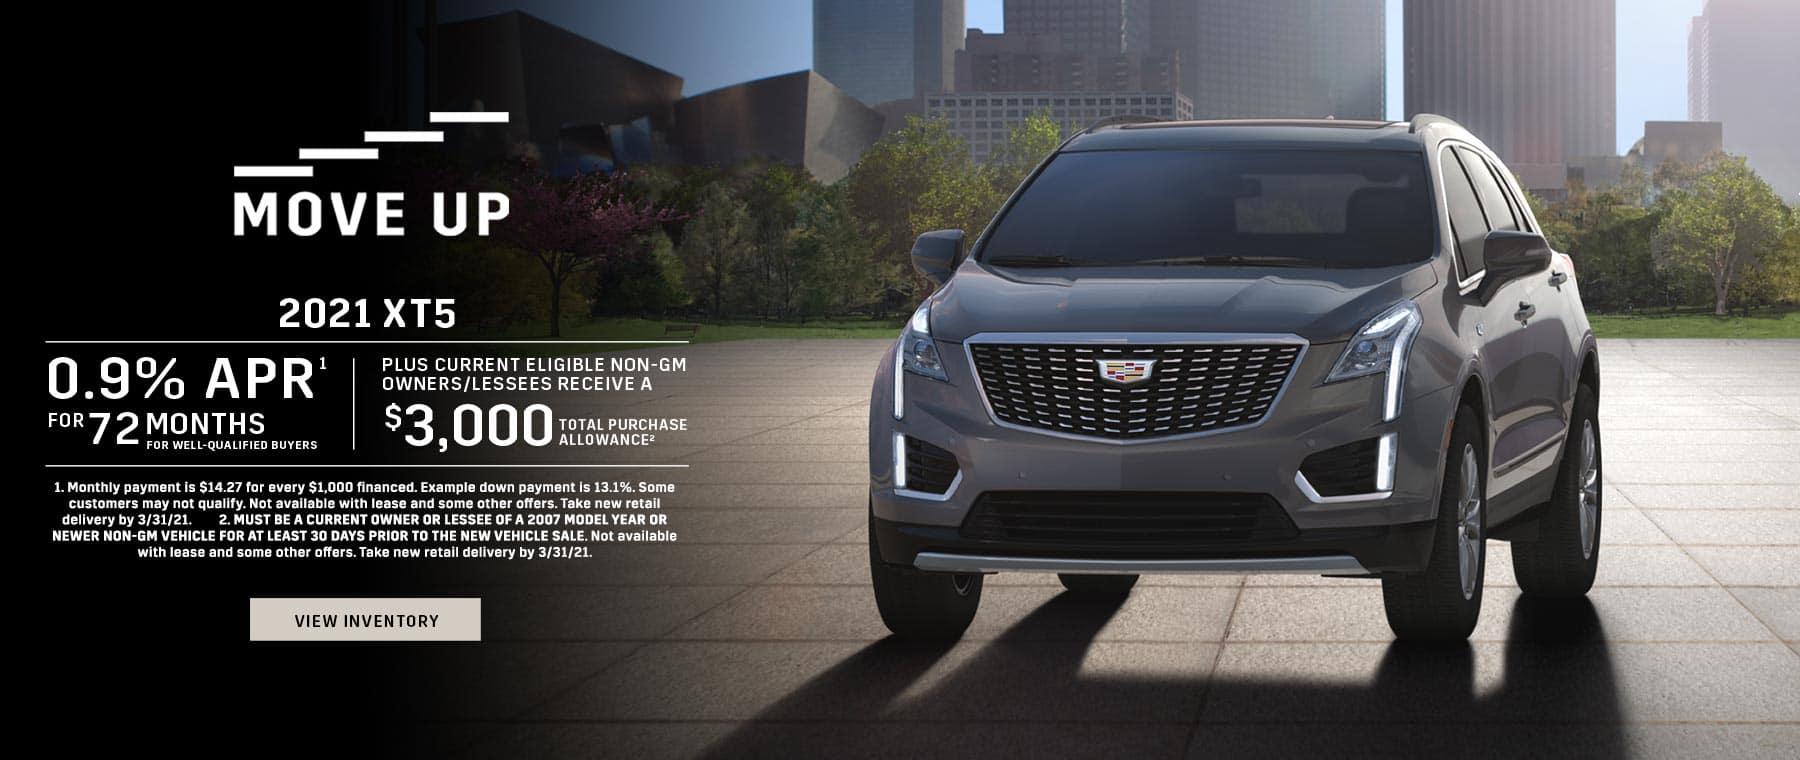 2021 Cadillac XT5 0.9% APR for 72 + $3,000 Purchase Allowance